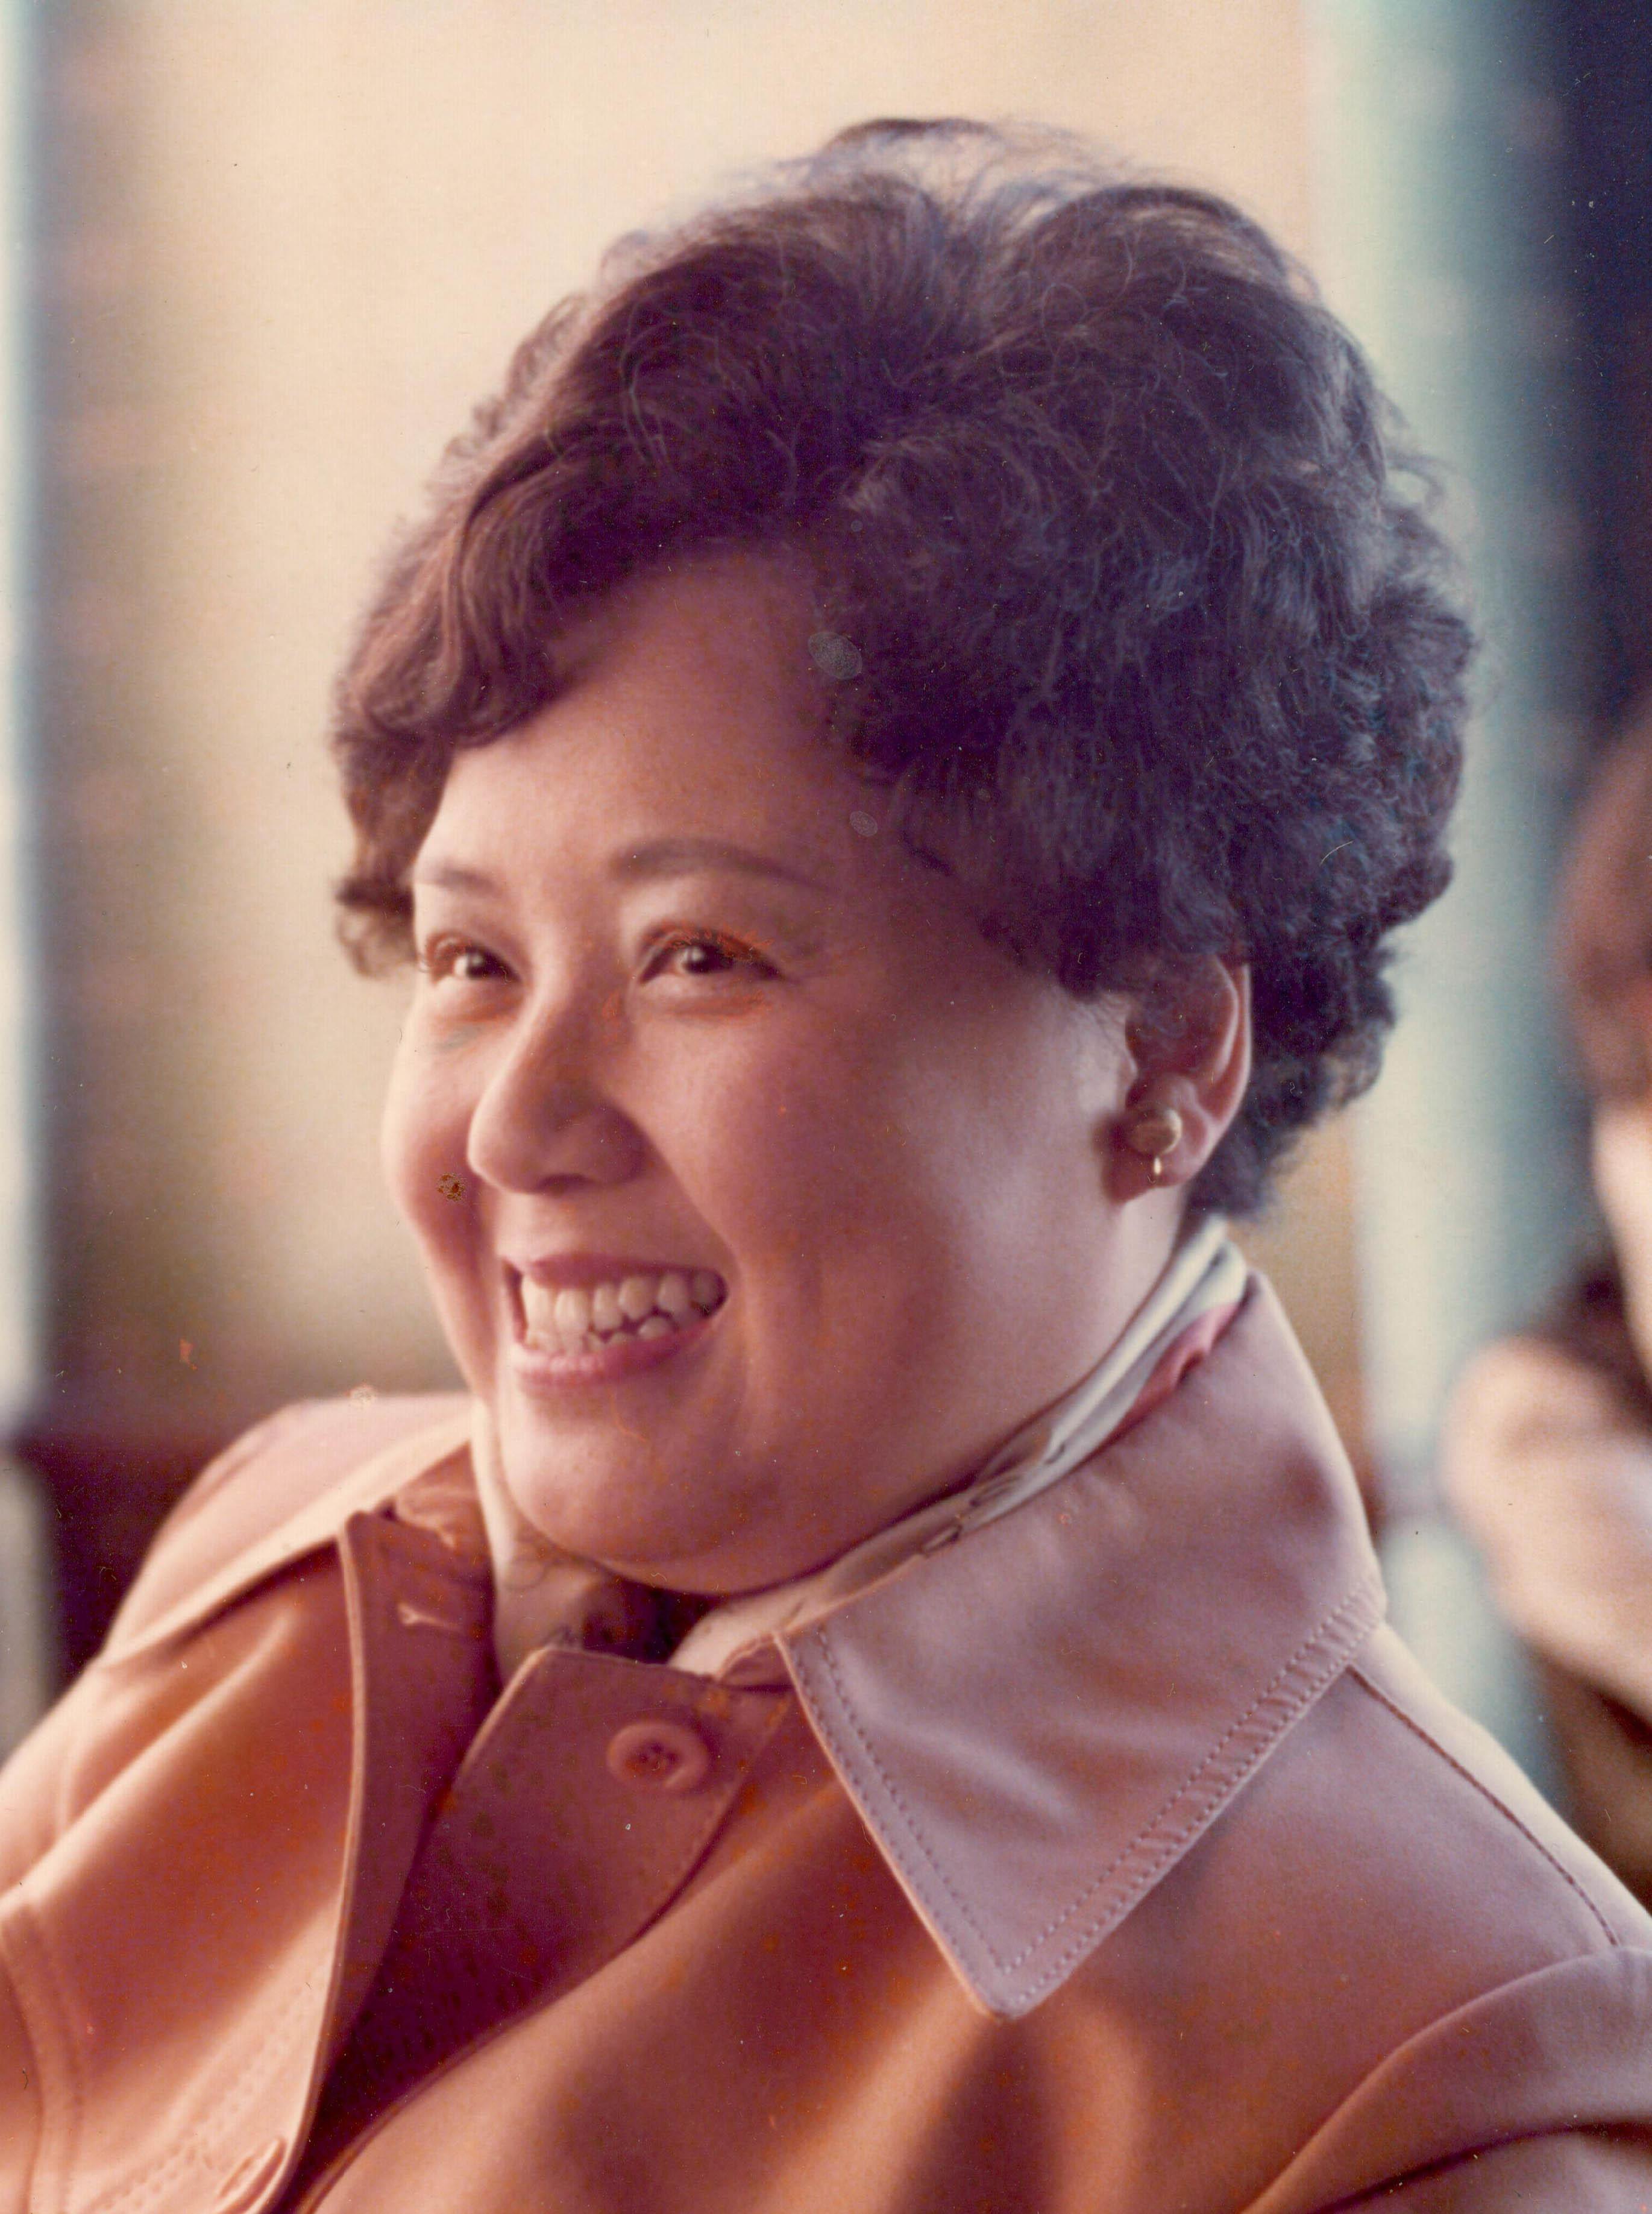 Jeanie K. Yee